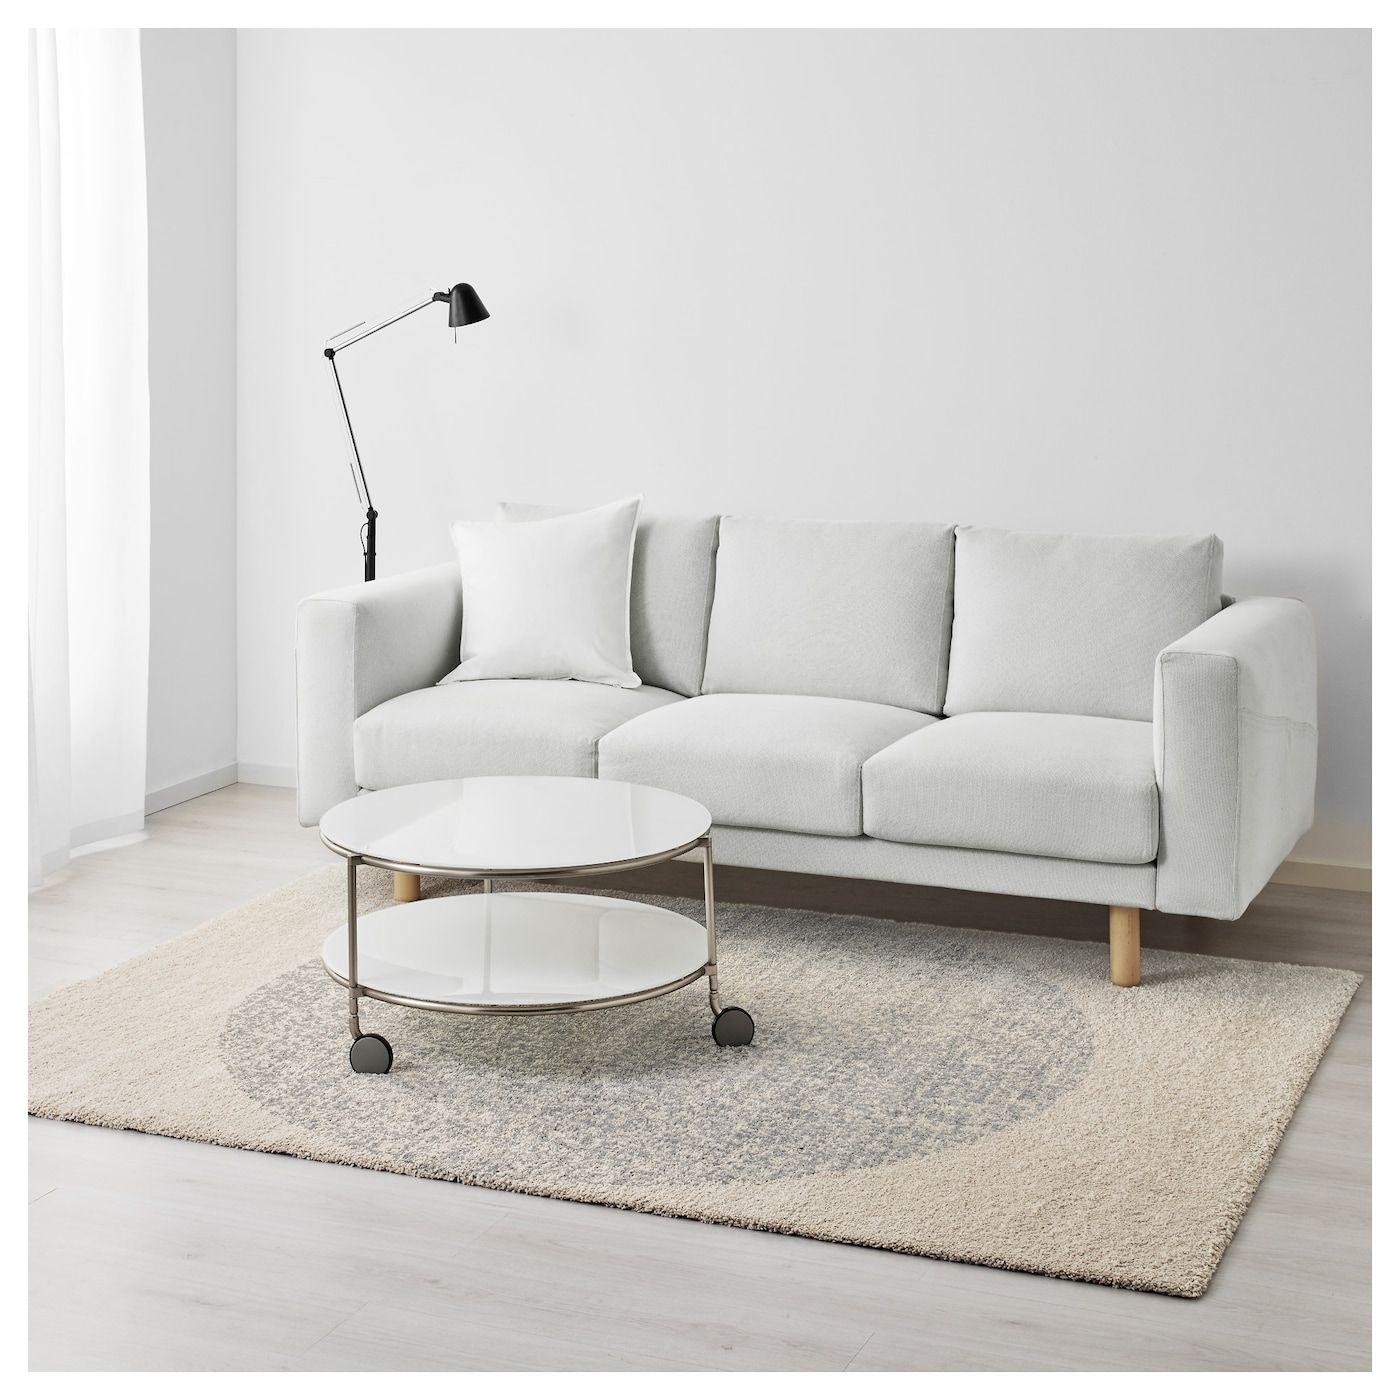 Skarreso Vloerkleed Hoogpolig Grijs 170x240 Cm Ikea Carpet Design At Home Furniture Store Ikea Rug [ 1400 x 1400 Pixel ]